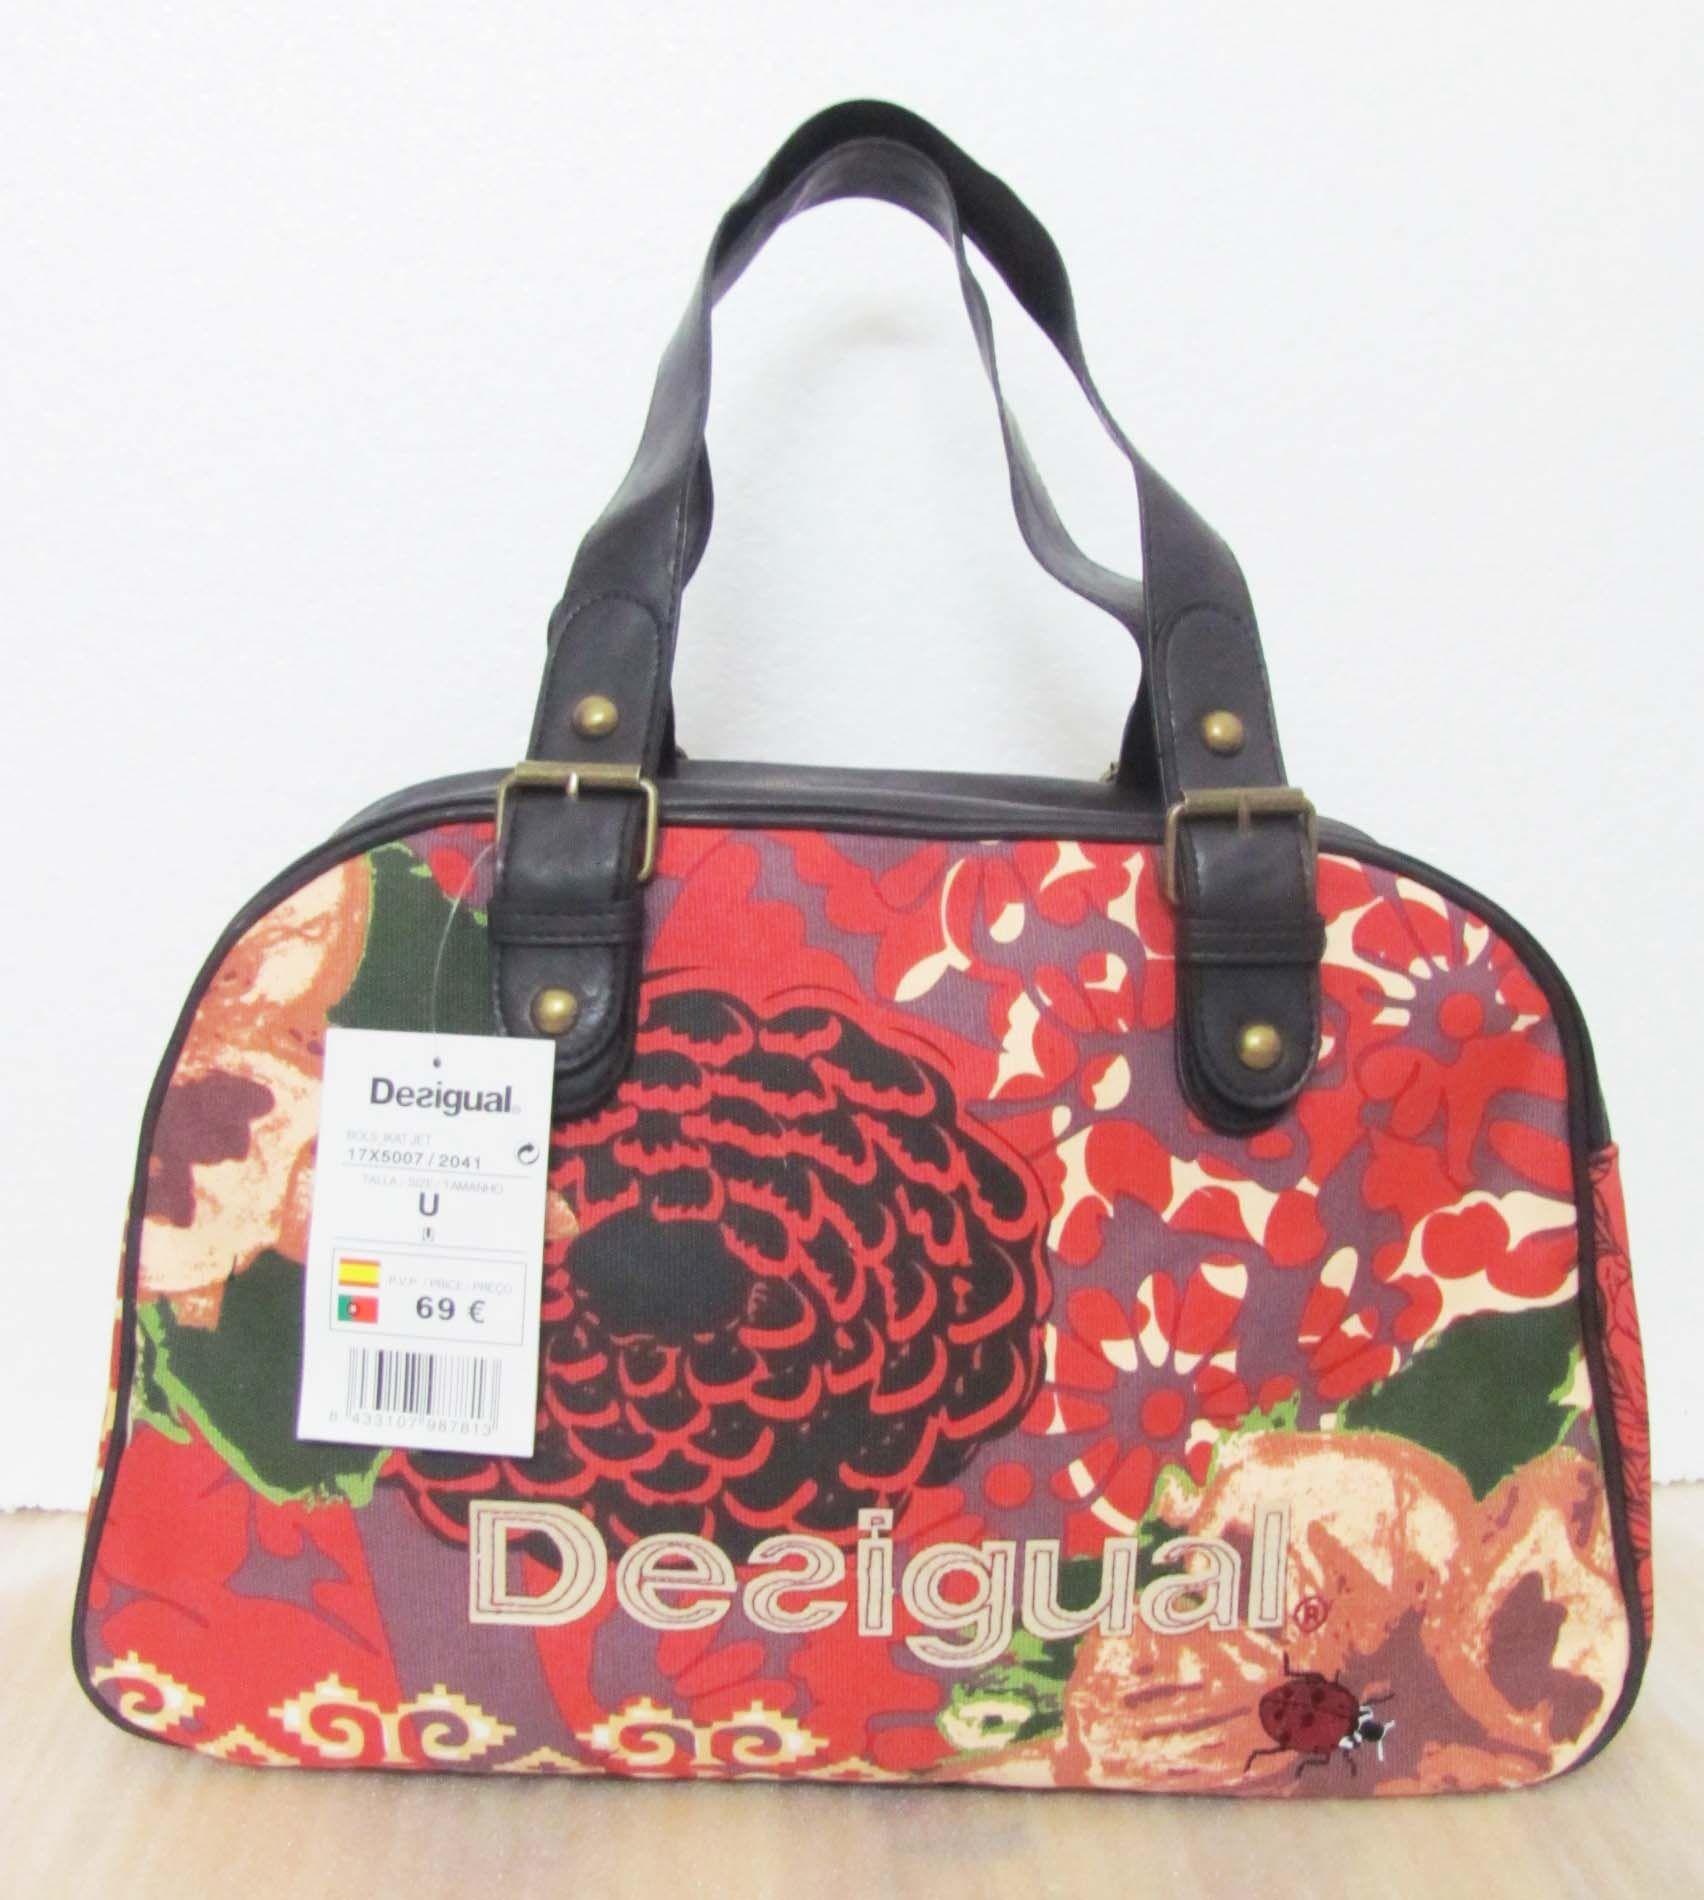 2015 New Desigual Womens Handbag Messenger Shoulder Bag 52